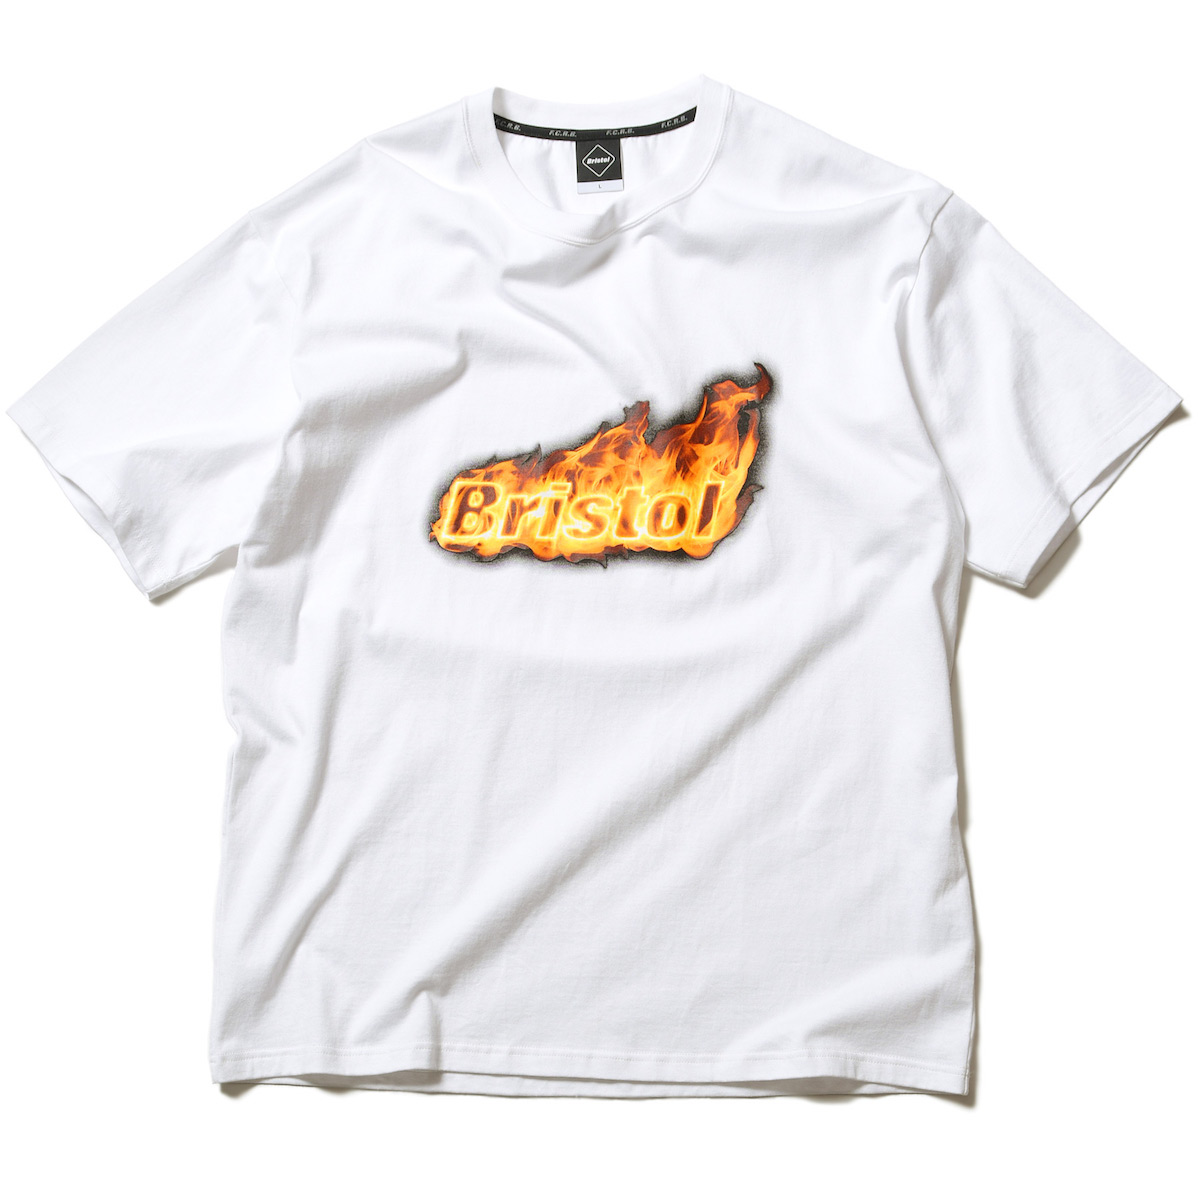 F.C.Real Bristol / FIRE BRISTOL S/S BIG TEE -White